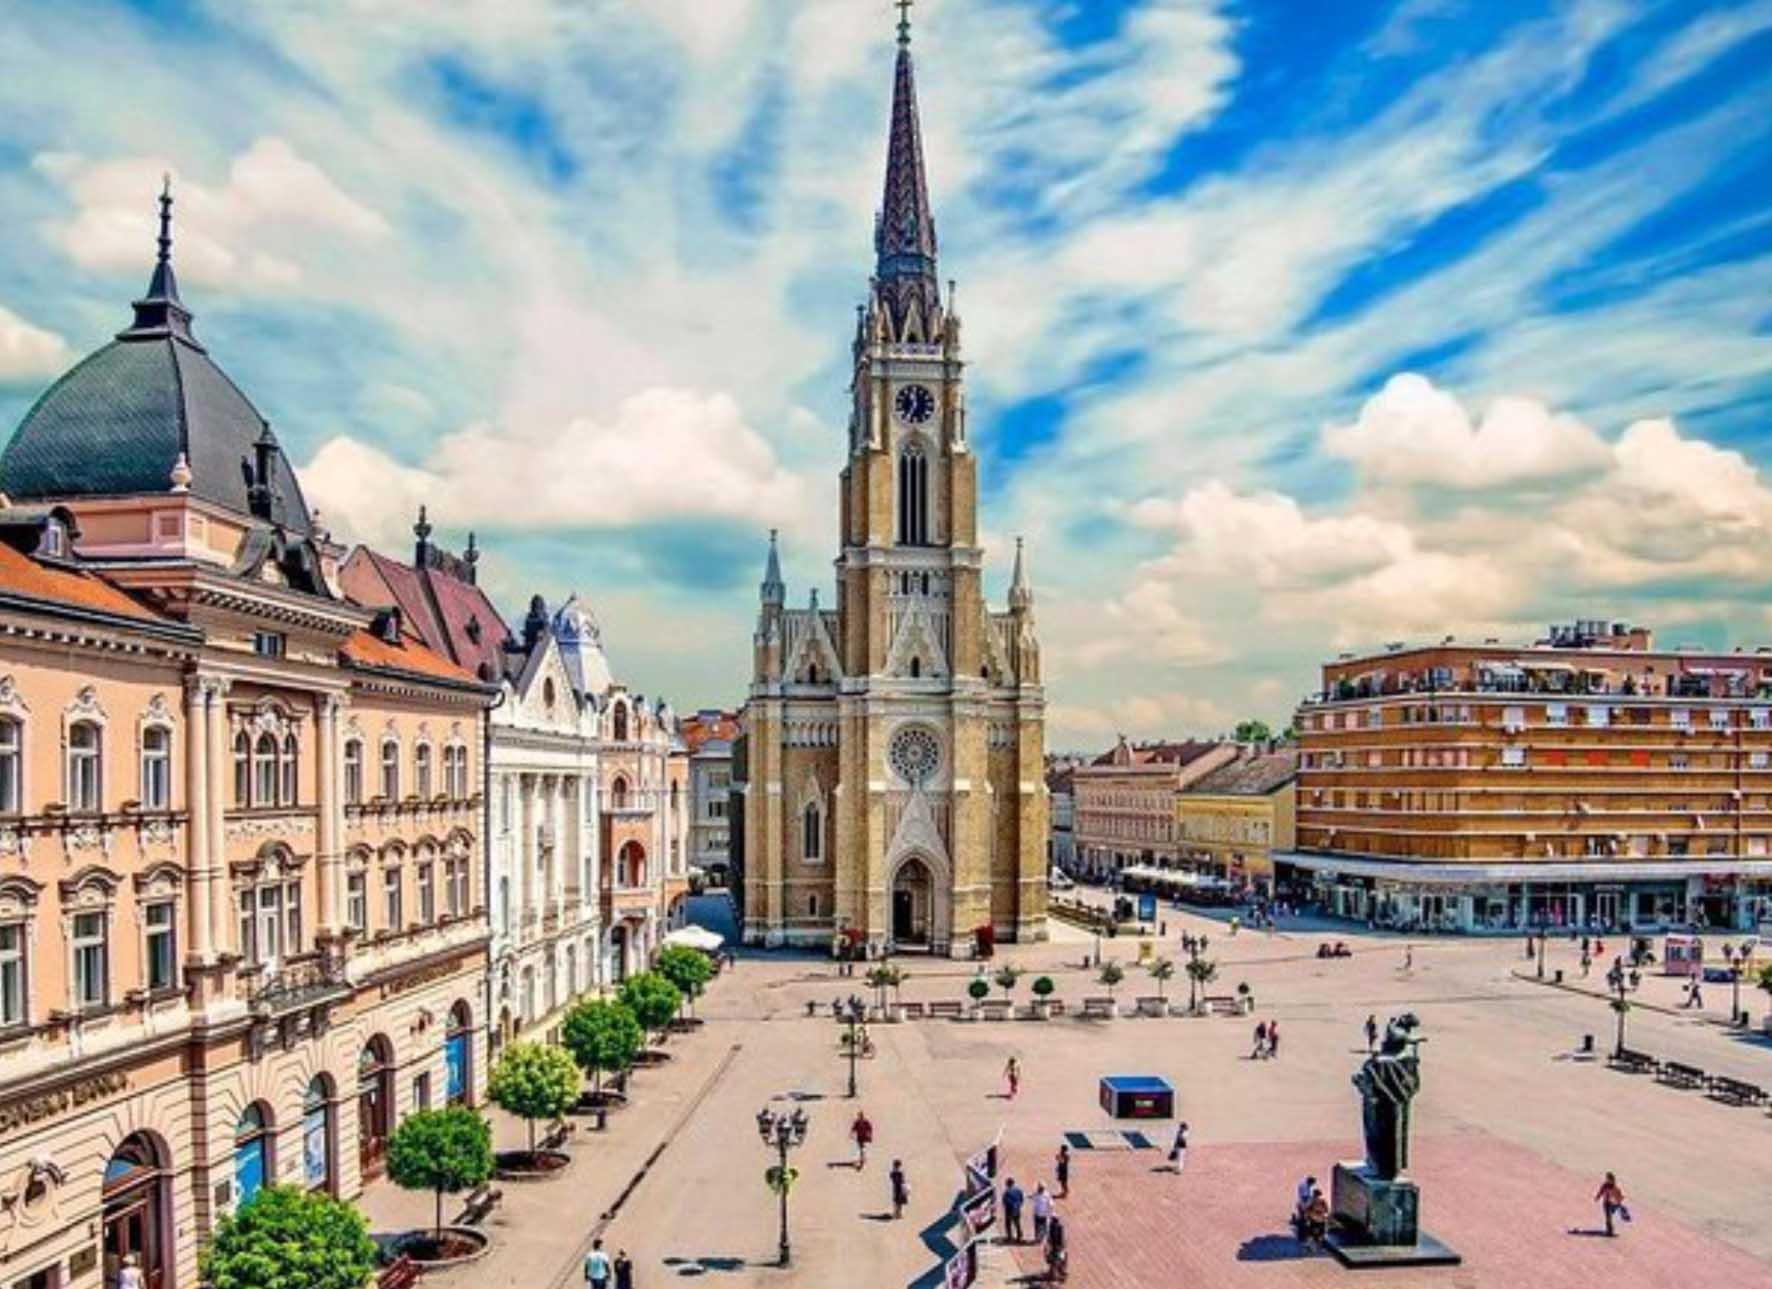 Učešće osoblja Univerziteta u Bihaću na online konferenciji APMS 2020 – Advances in manufacturing systems u Novom Sadu